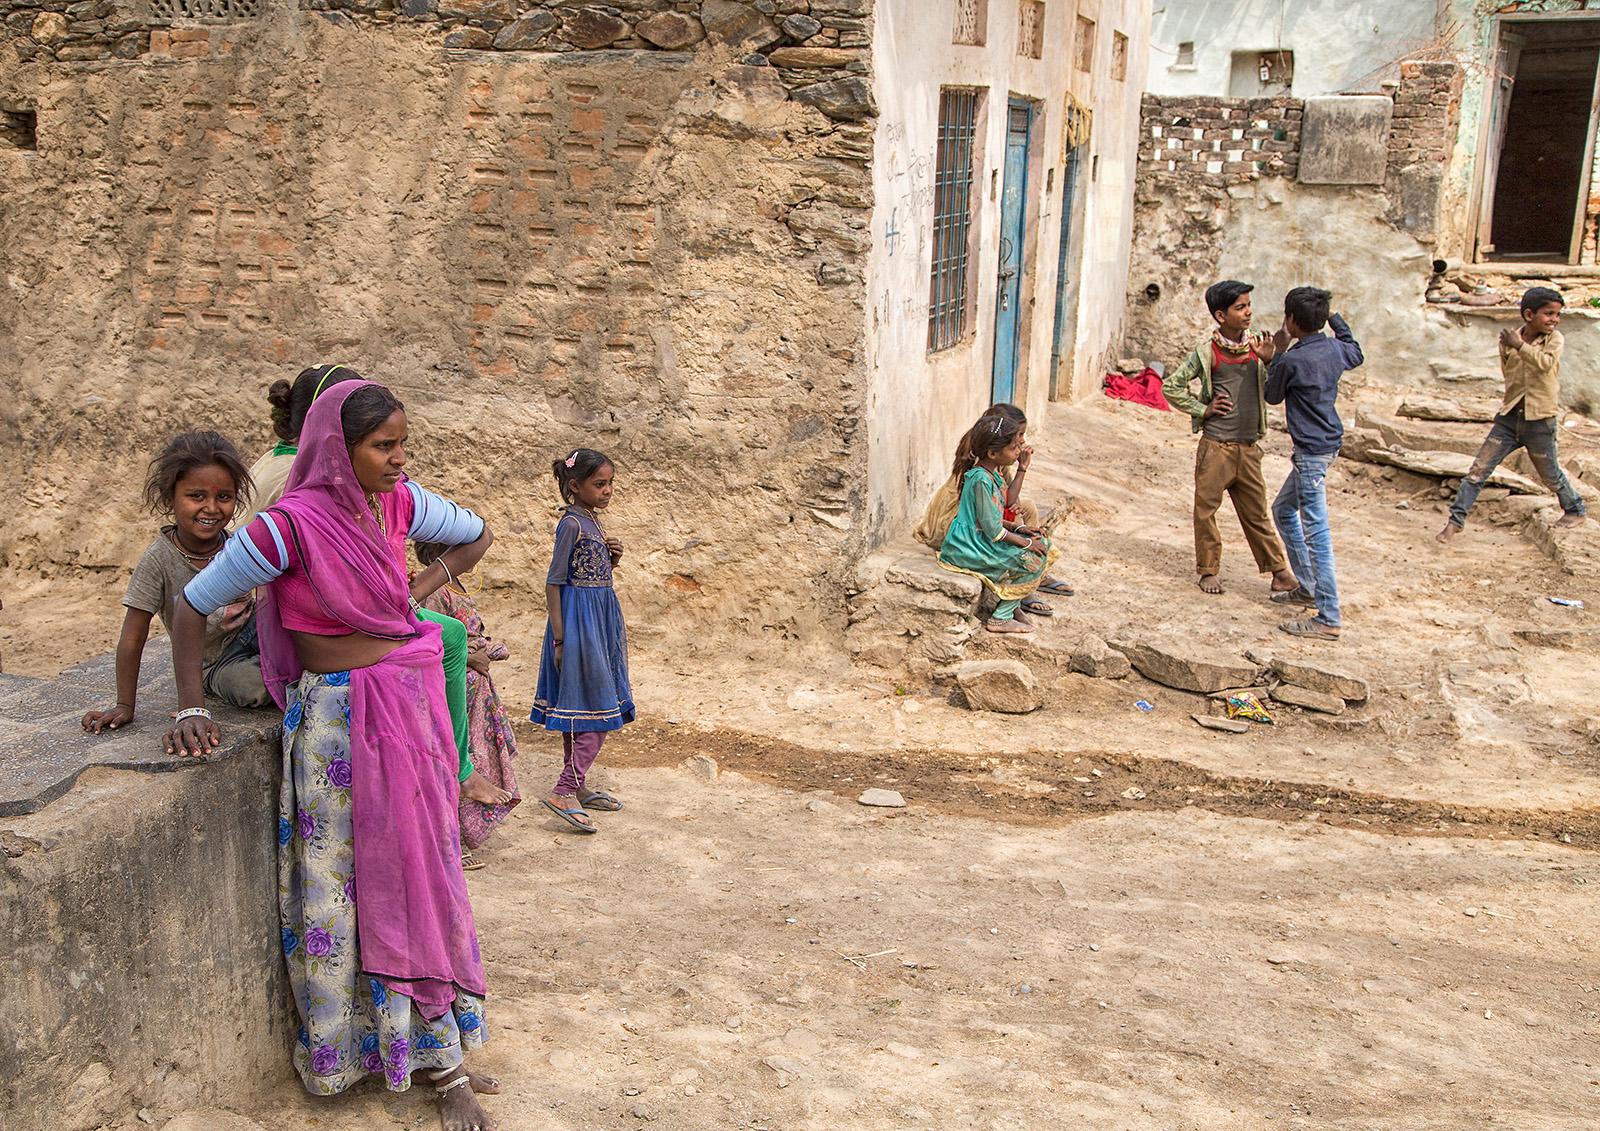 HC 'Indian Village' by Tony Oliver